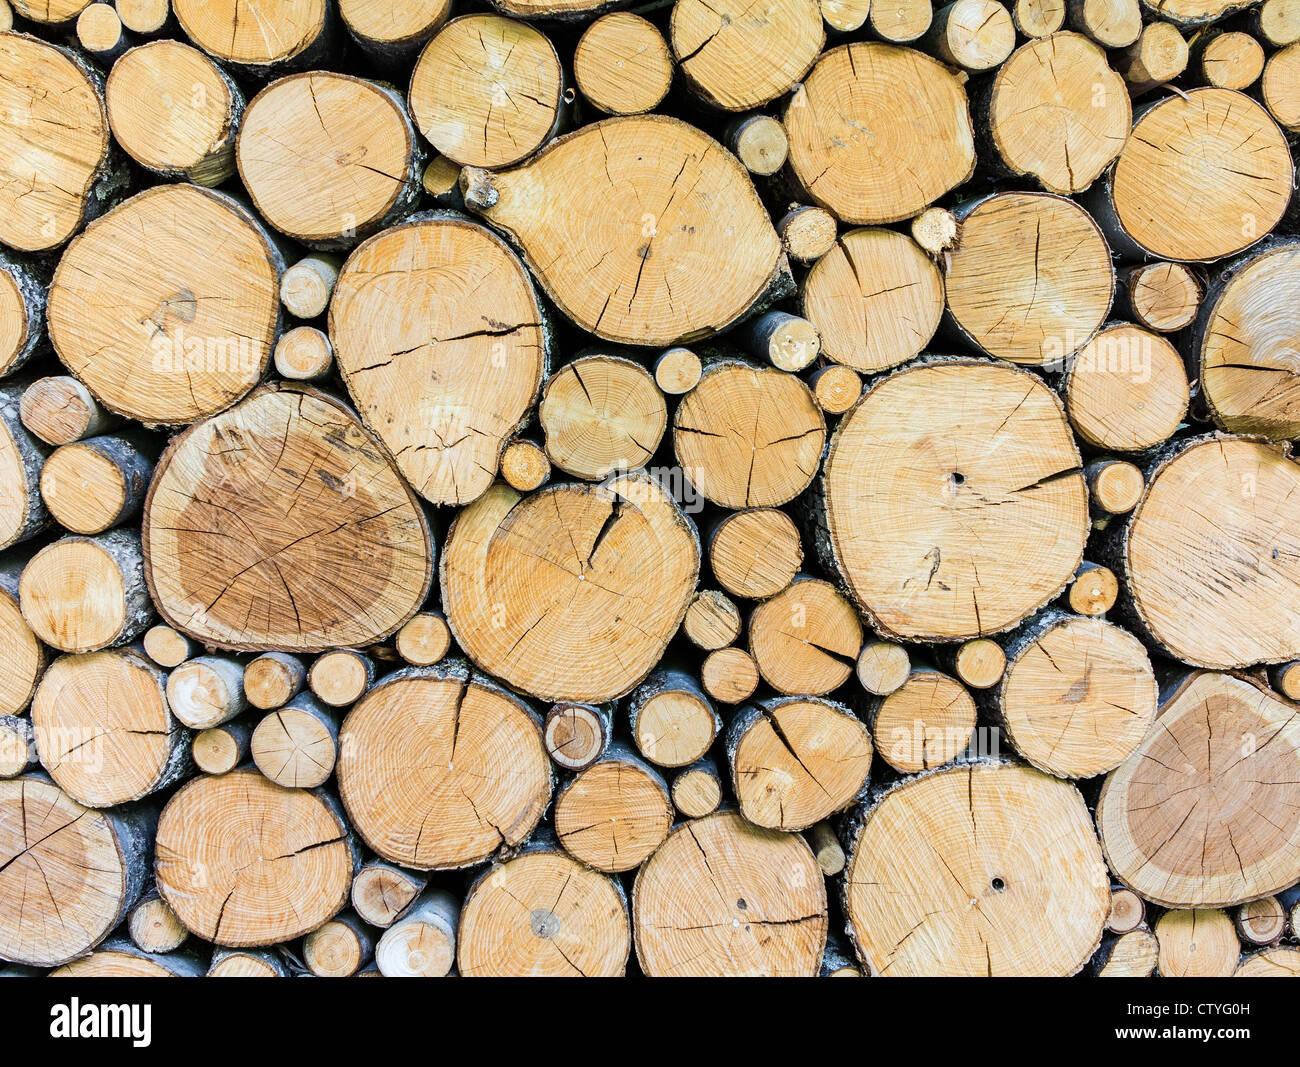 Ein Holzstapel Hintergrund Holz Stockbild